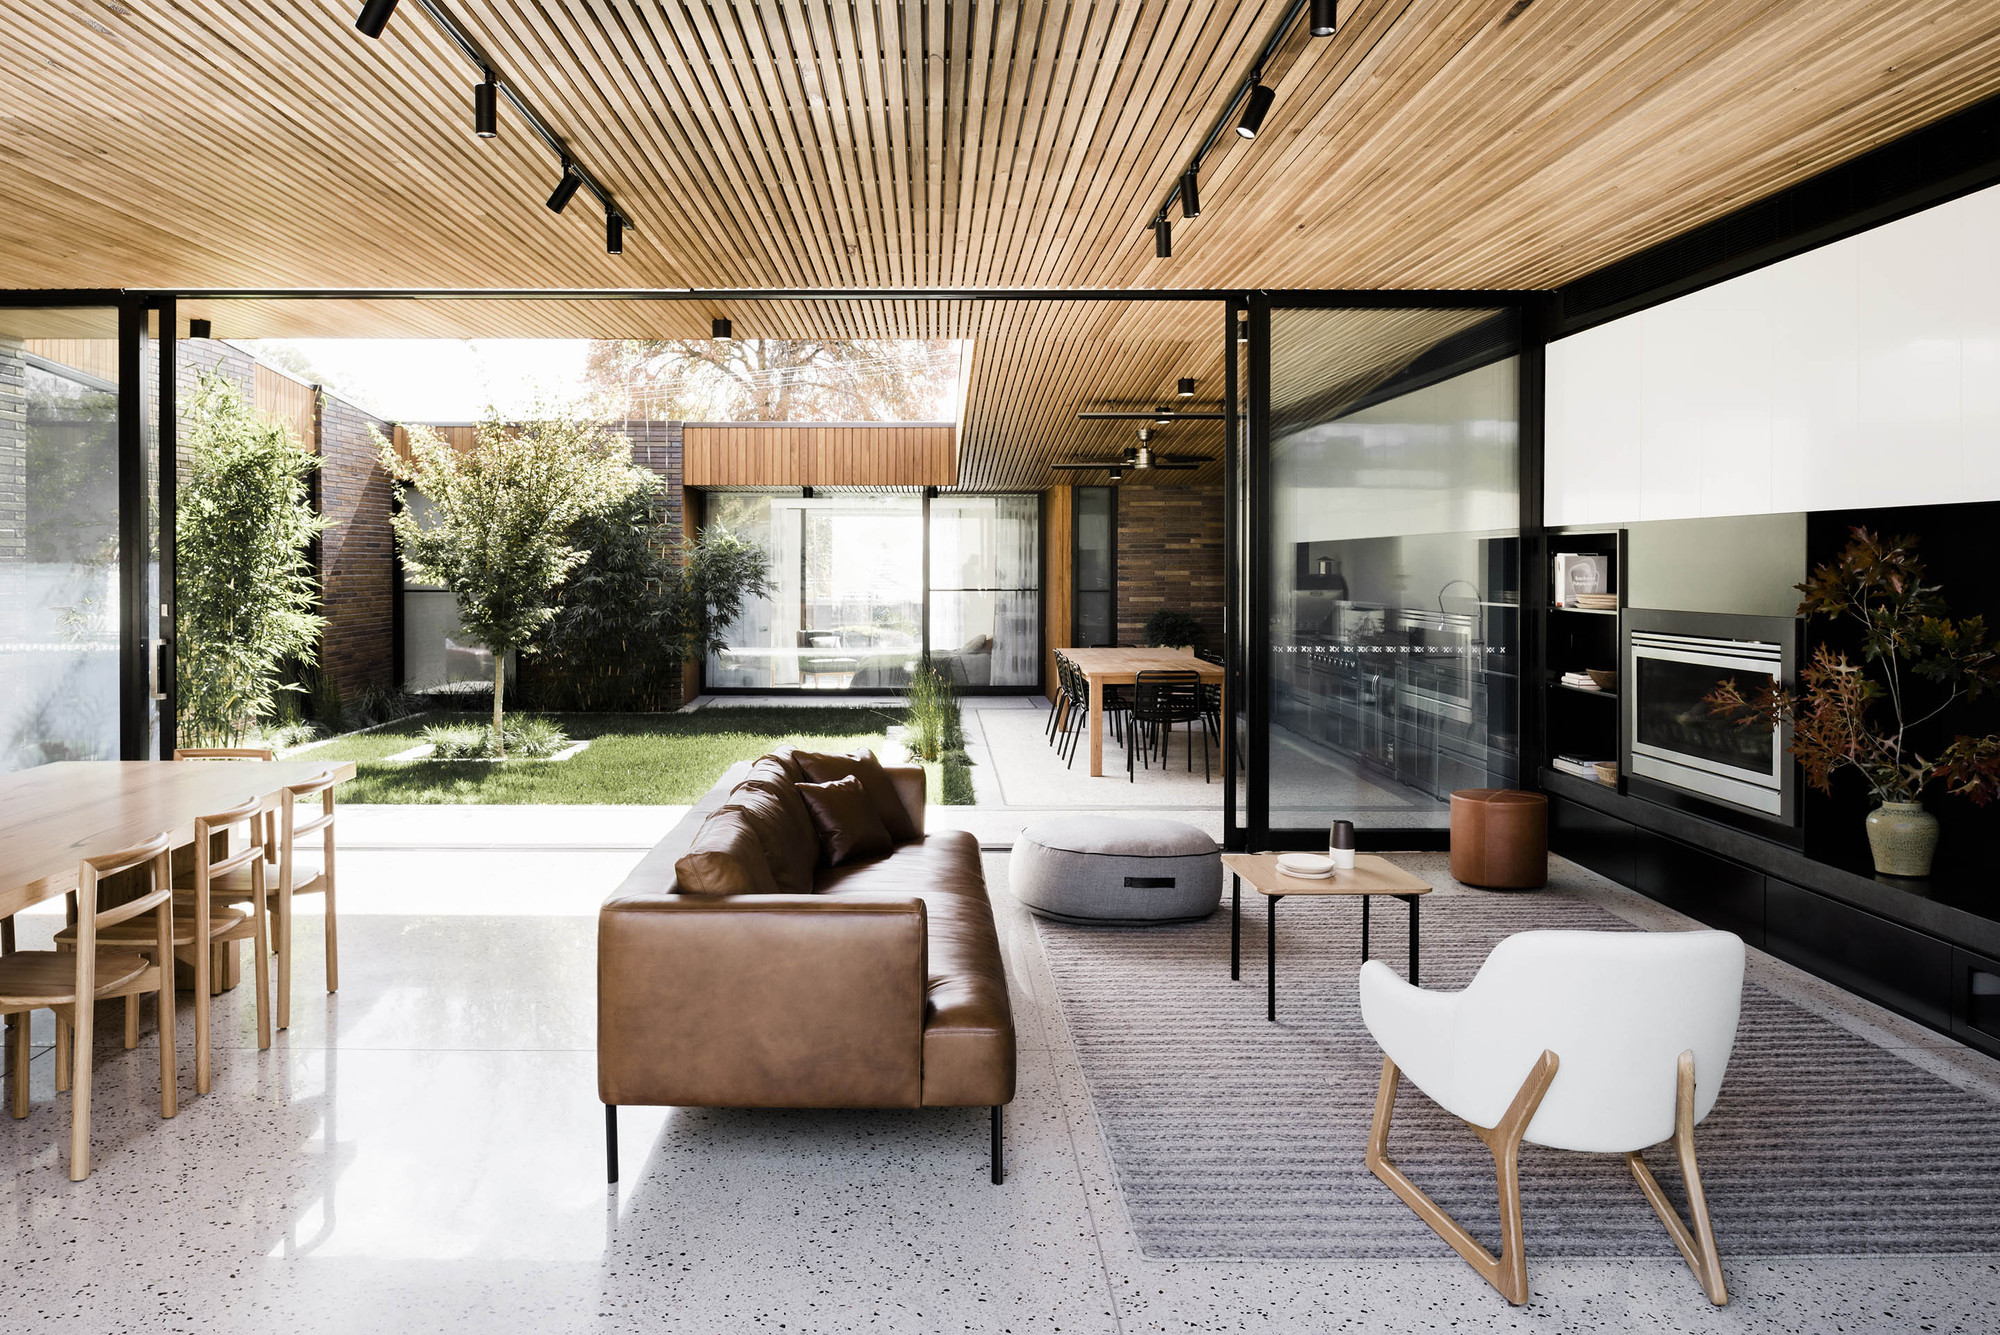 Courtyard House / FIGR Architecture & Design